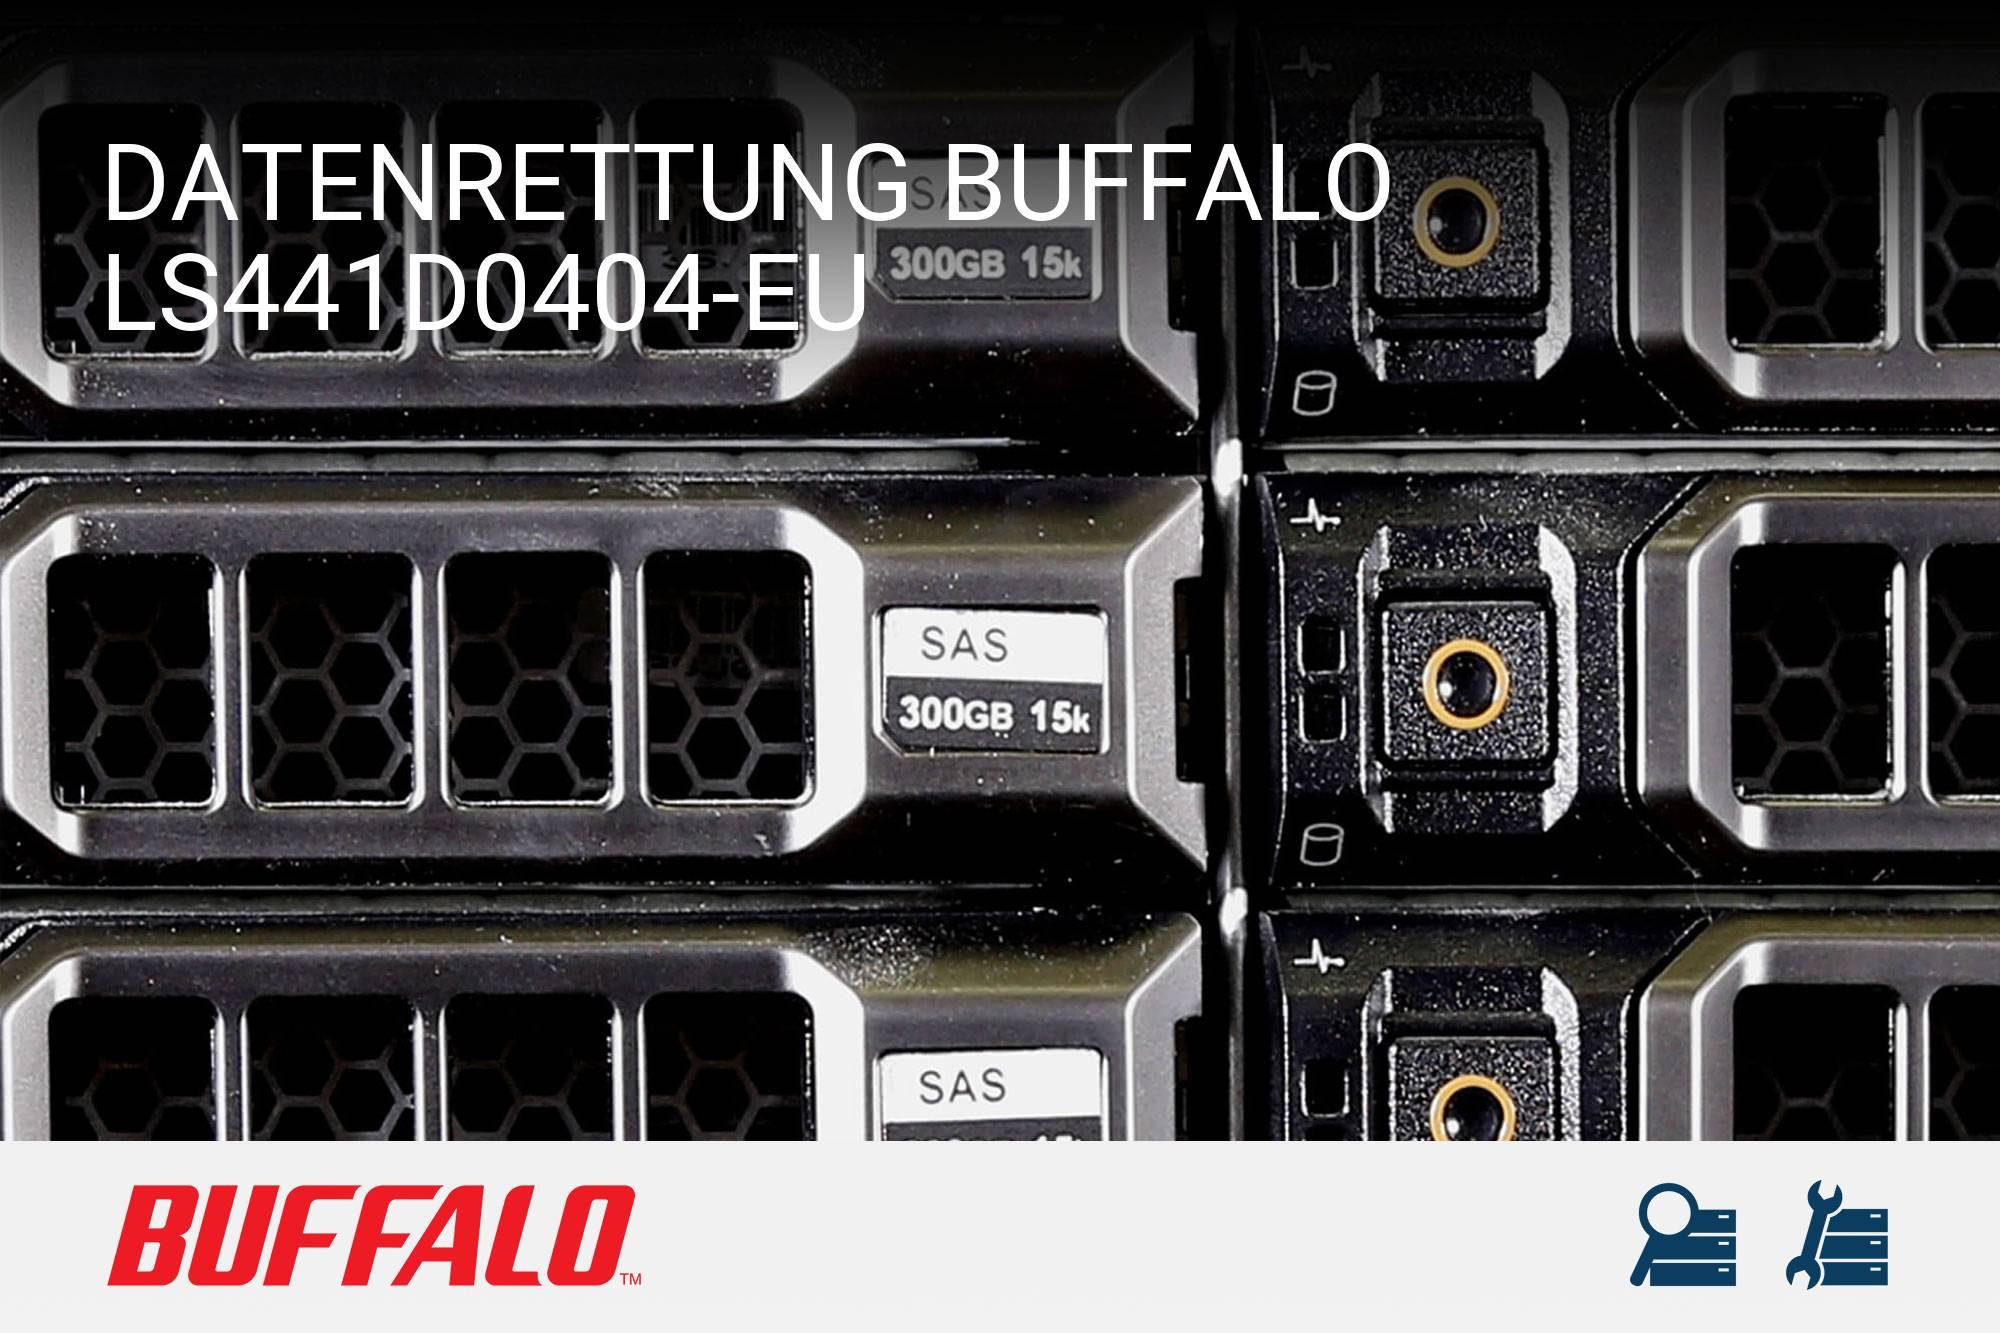 Buffalo LS441D0404-EU